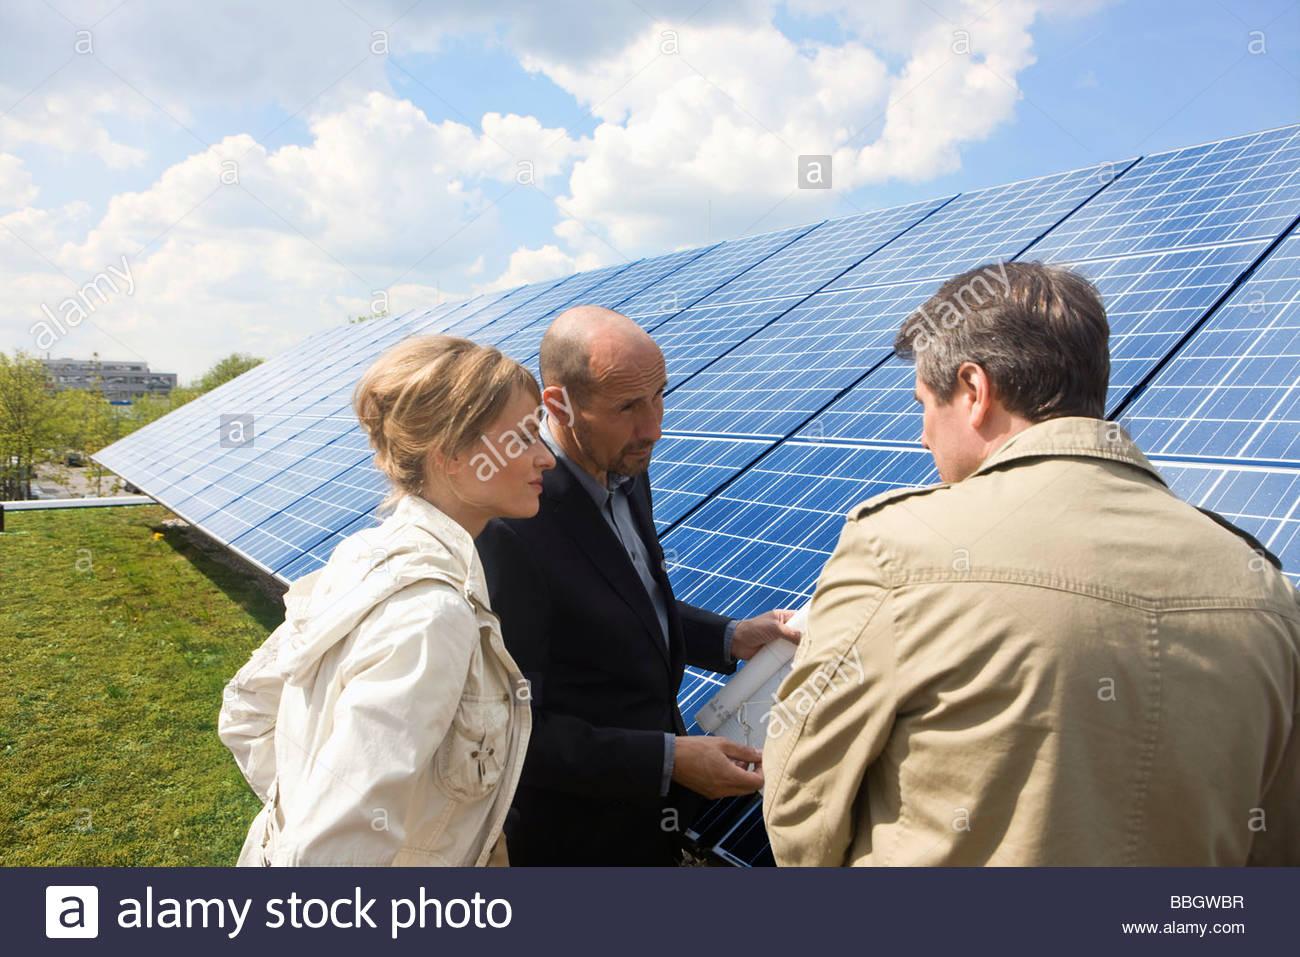 Three mature adults reading plans laid on solar panels Munich, Bavaria, Germany - Stock Image